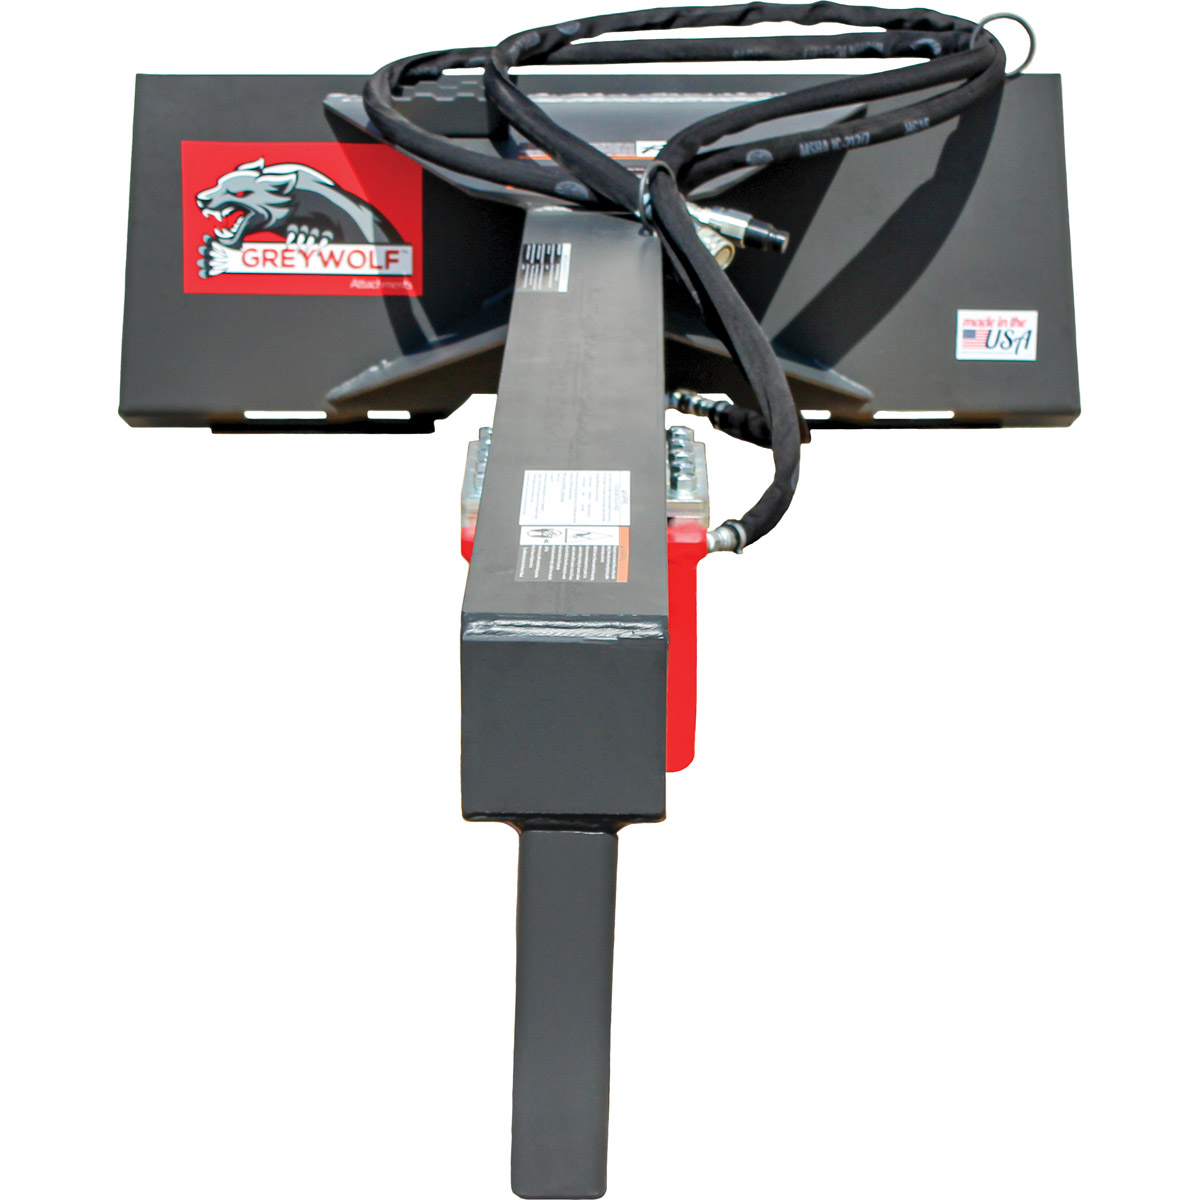 GreyWolf 24 Ton Log Splitter Skid Steer Attachment